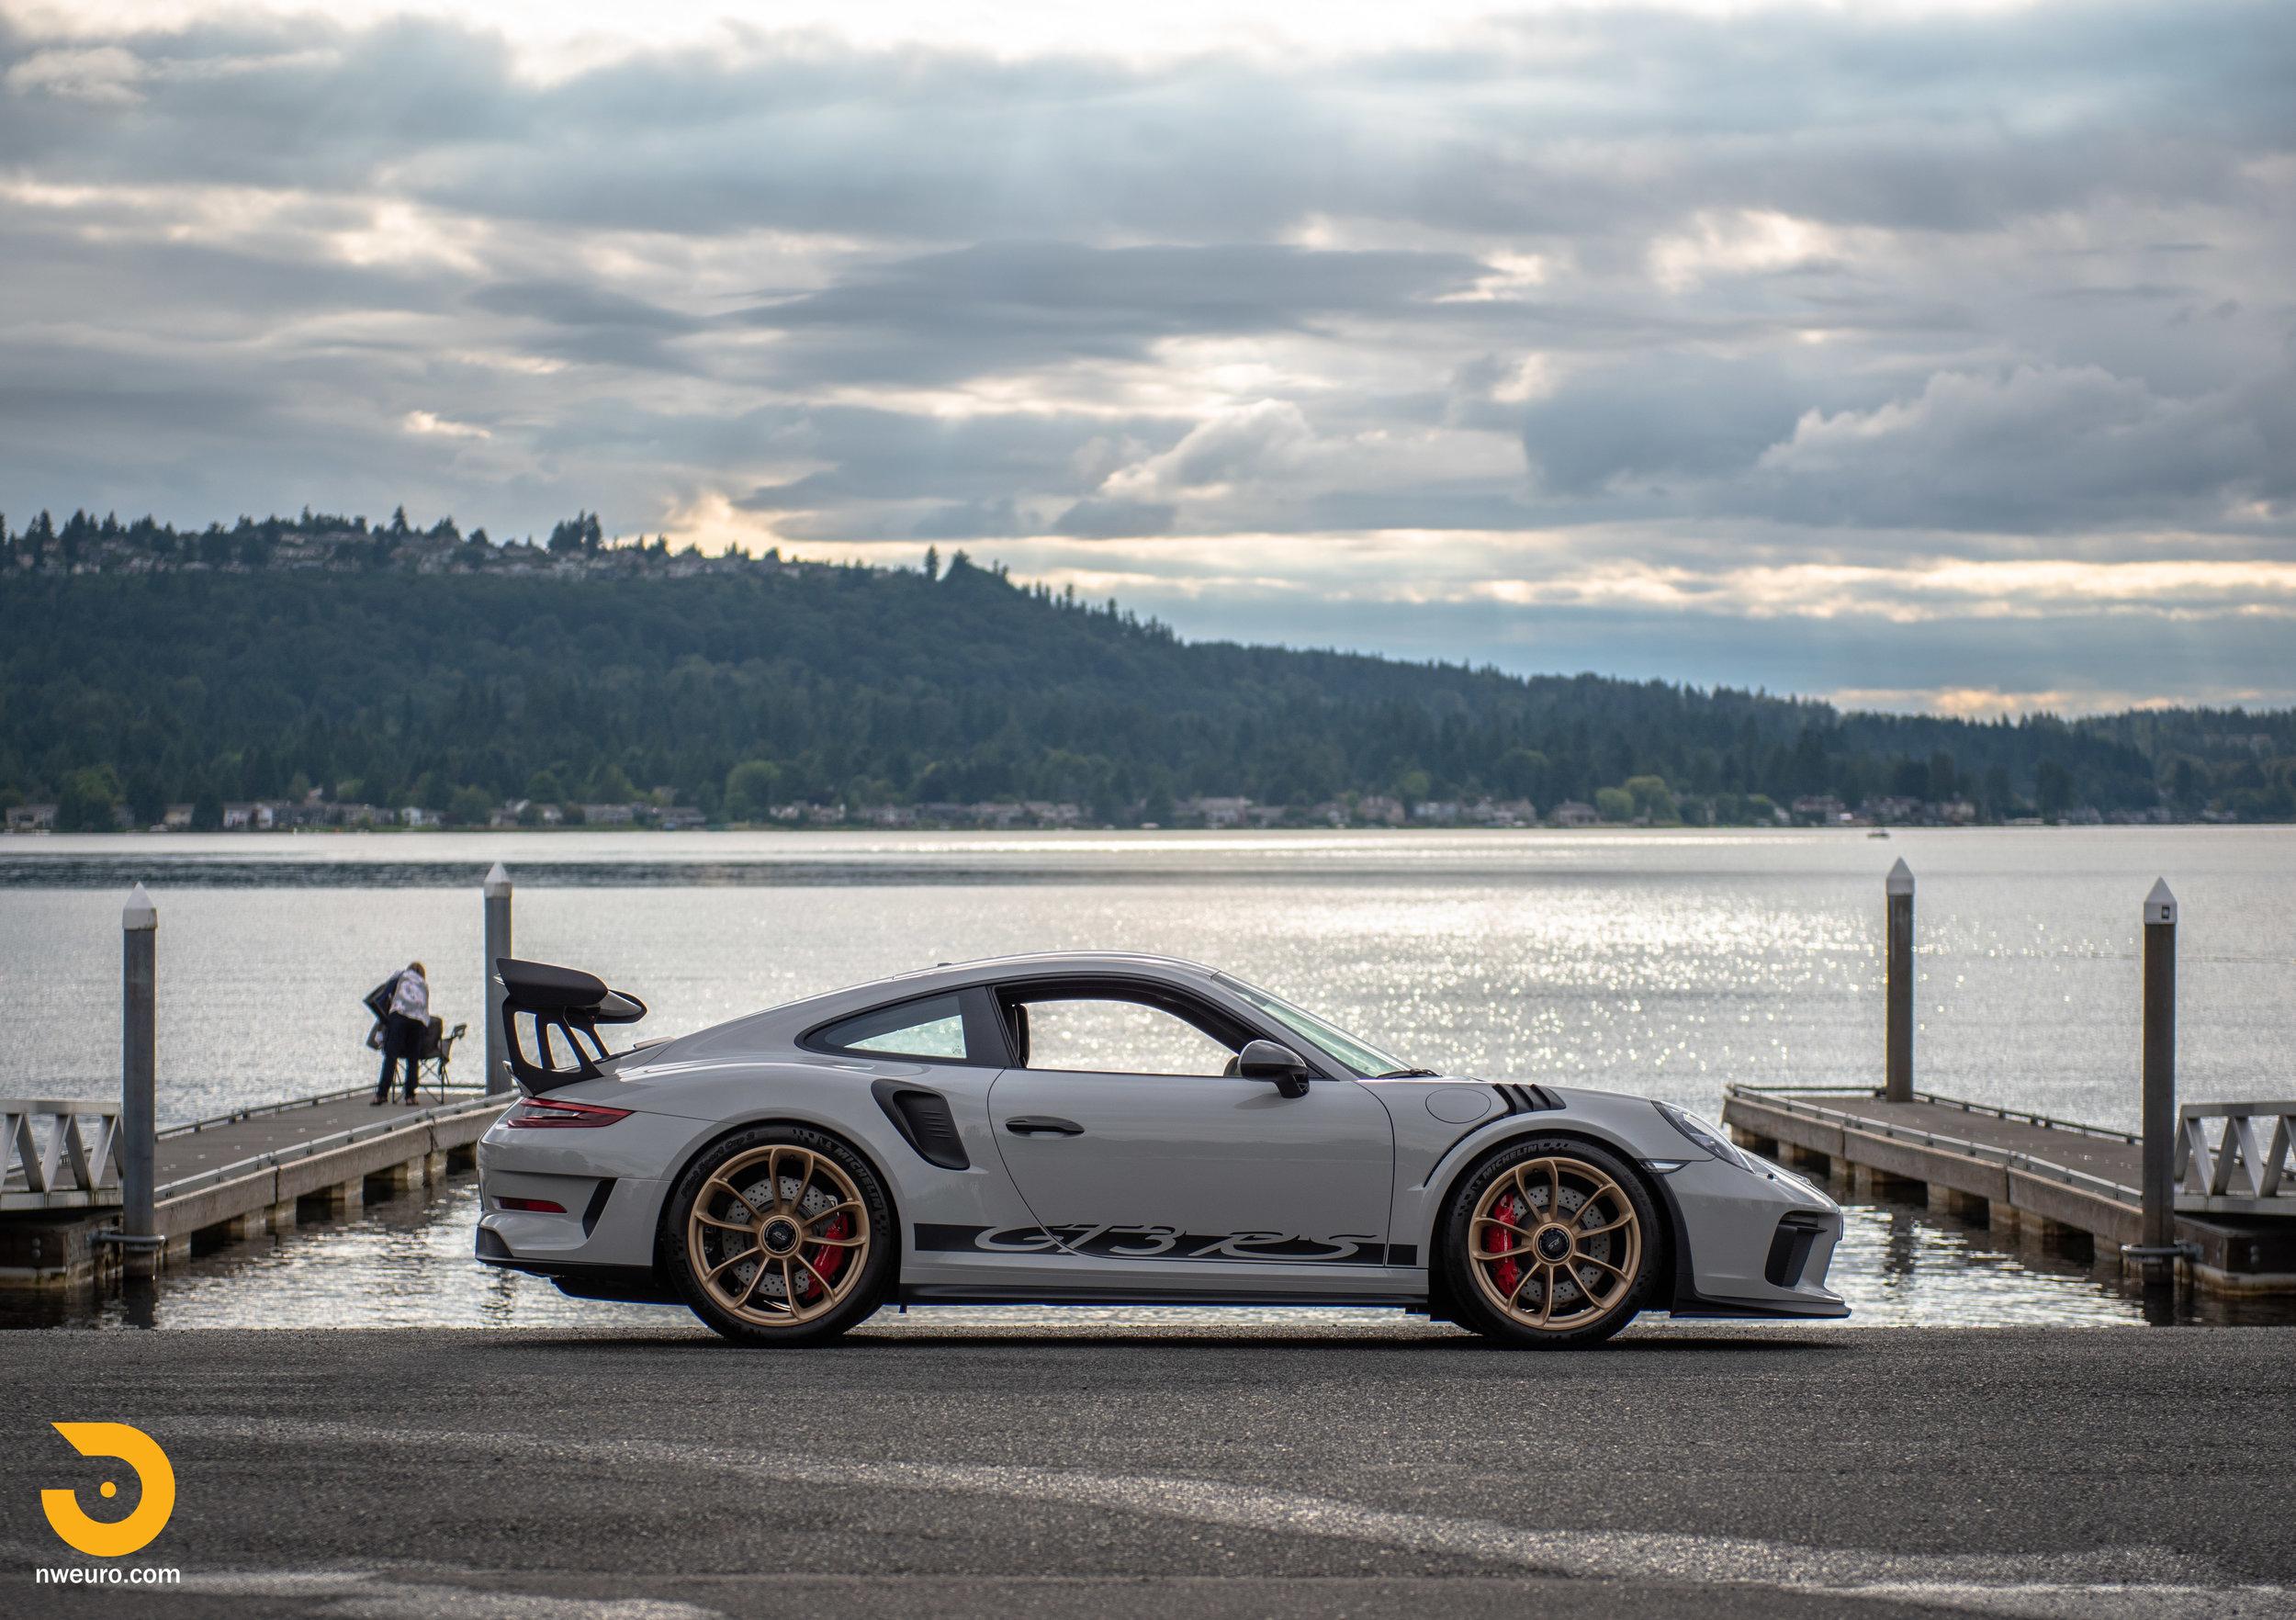 2019 Porsche GT3 RS - Chalk-1.jpg